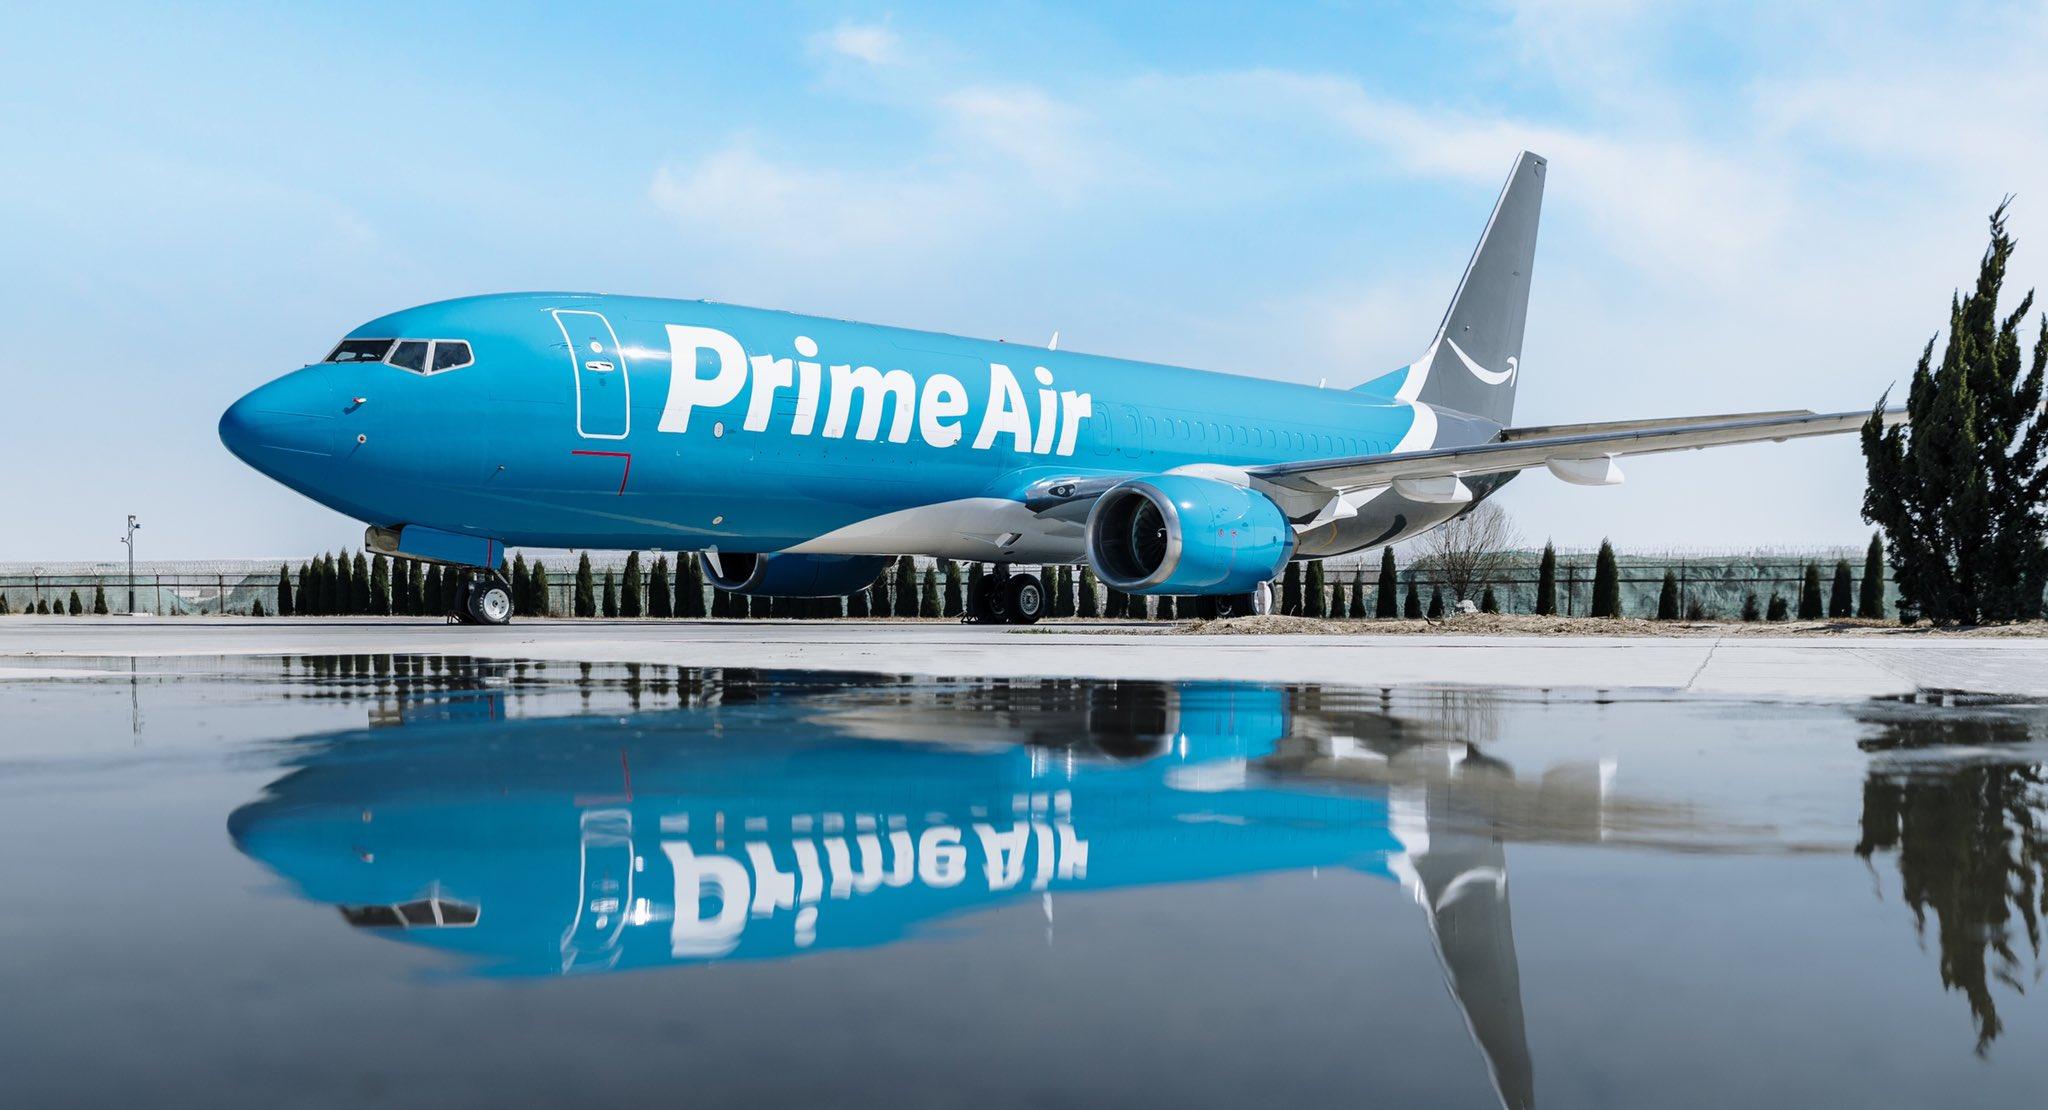 amazon.com prime air 737 source-amzn